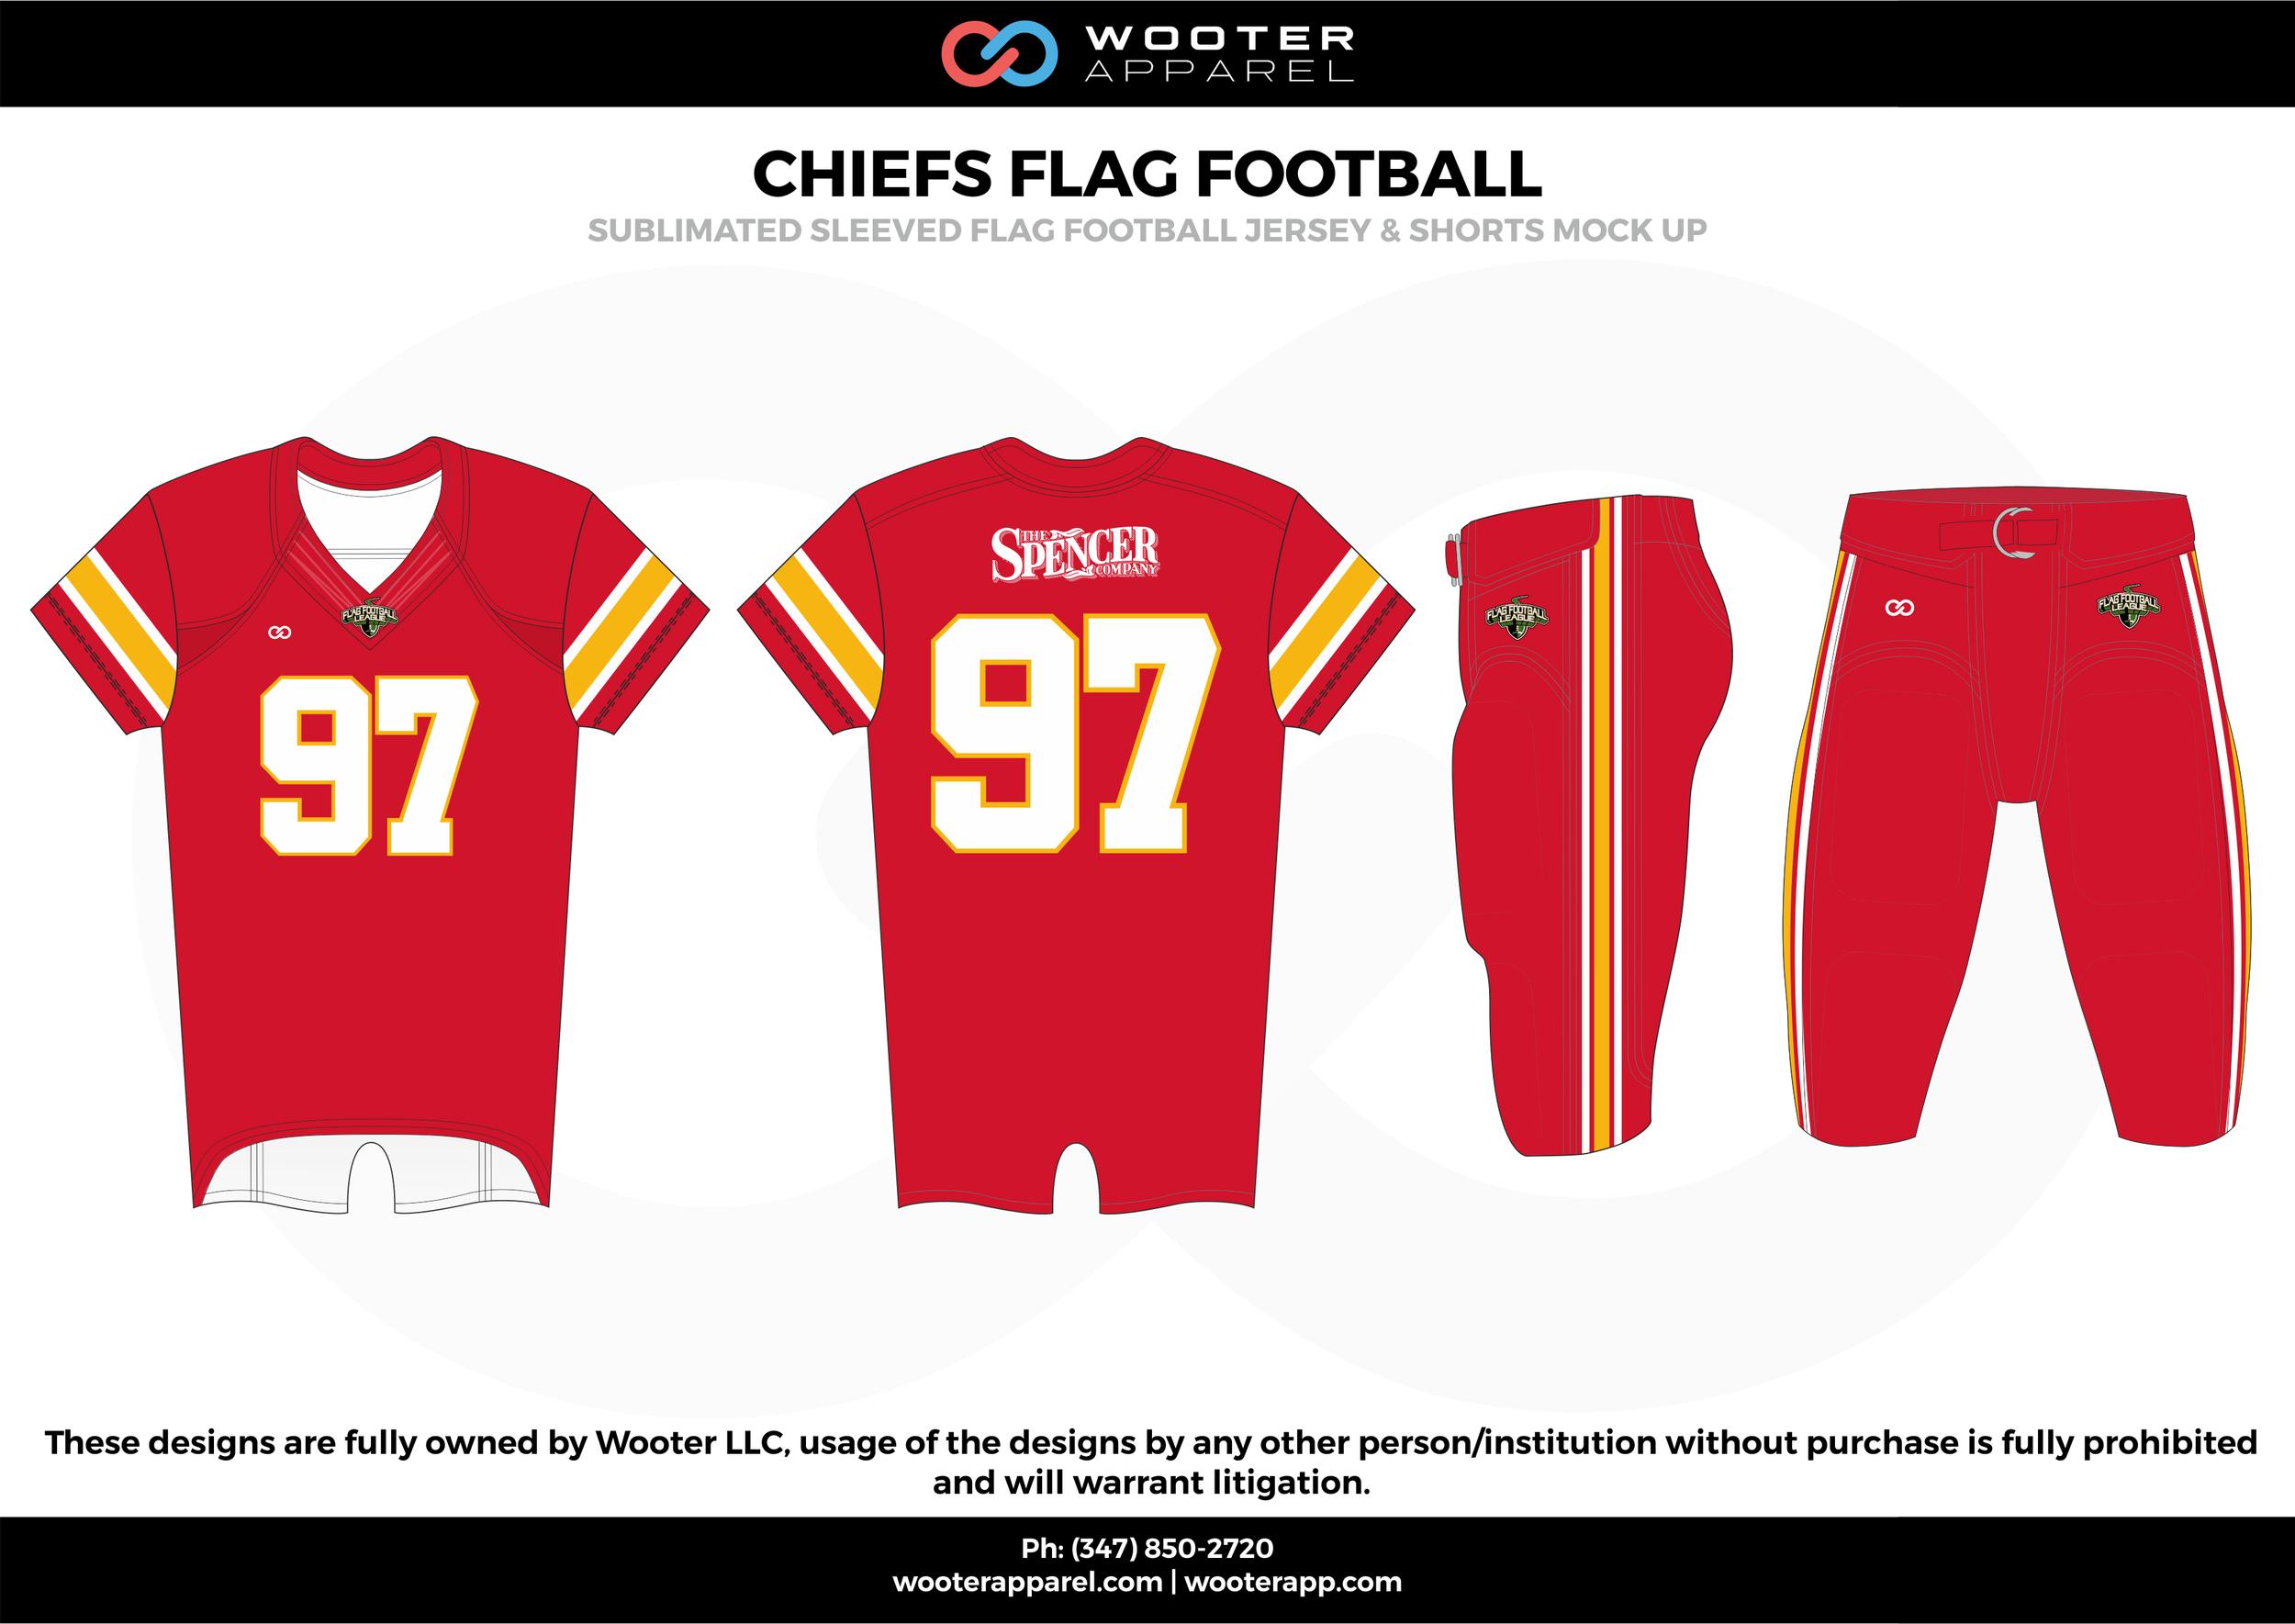 CHIEFS FLAG FOOTBALL red white yellow flag football uniforms jerseys pants